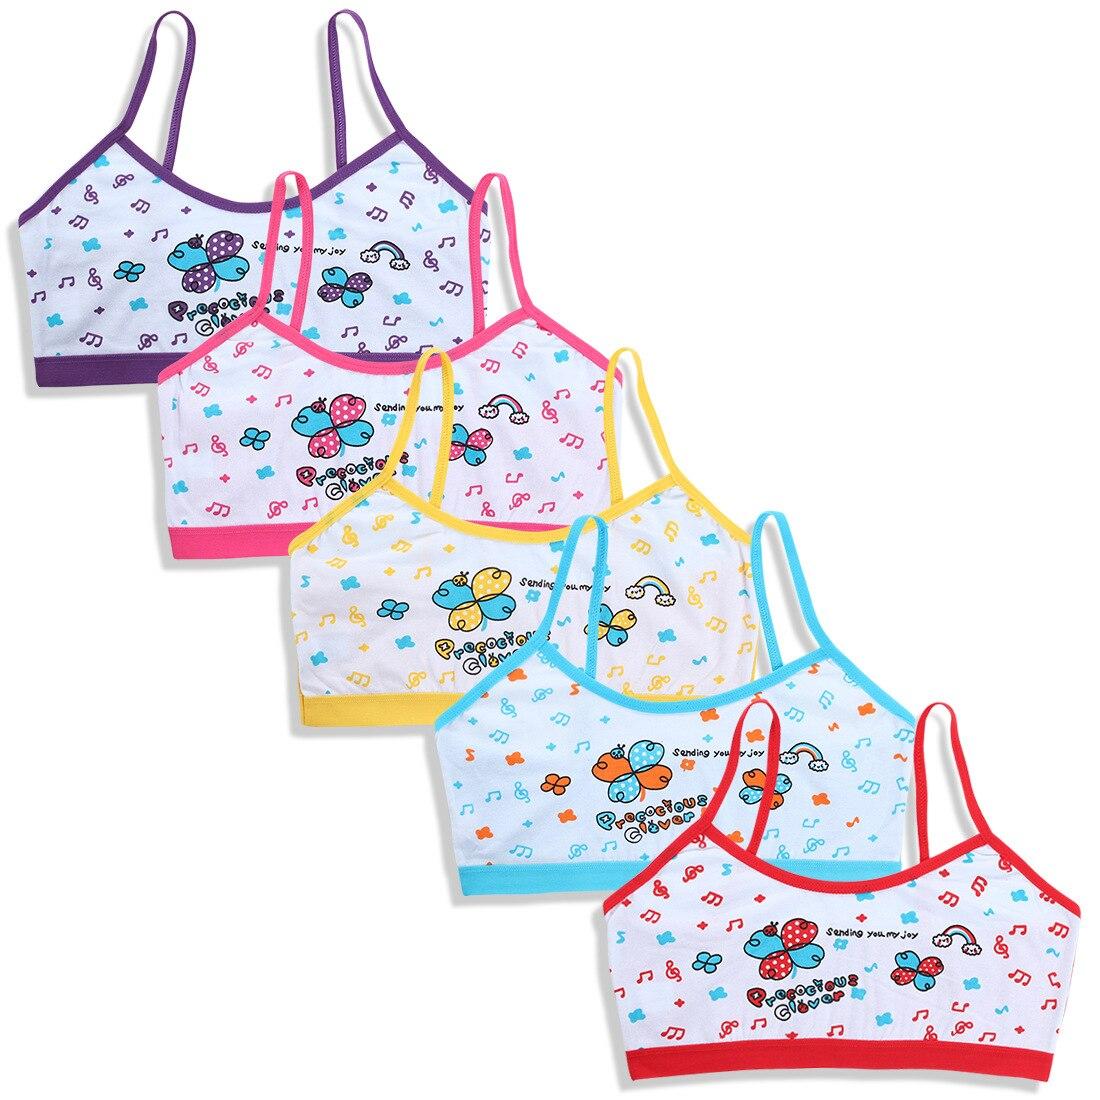 4Pc/Lot Teenager Tank Top For Girls Cotton Underwear Model Cartoon Kids Singlets Children Camisole Baby Bras Undershirt